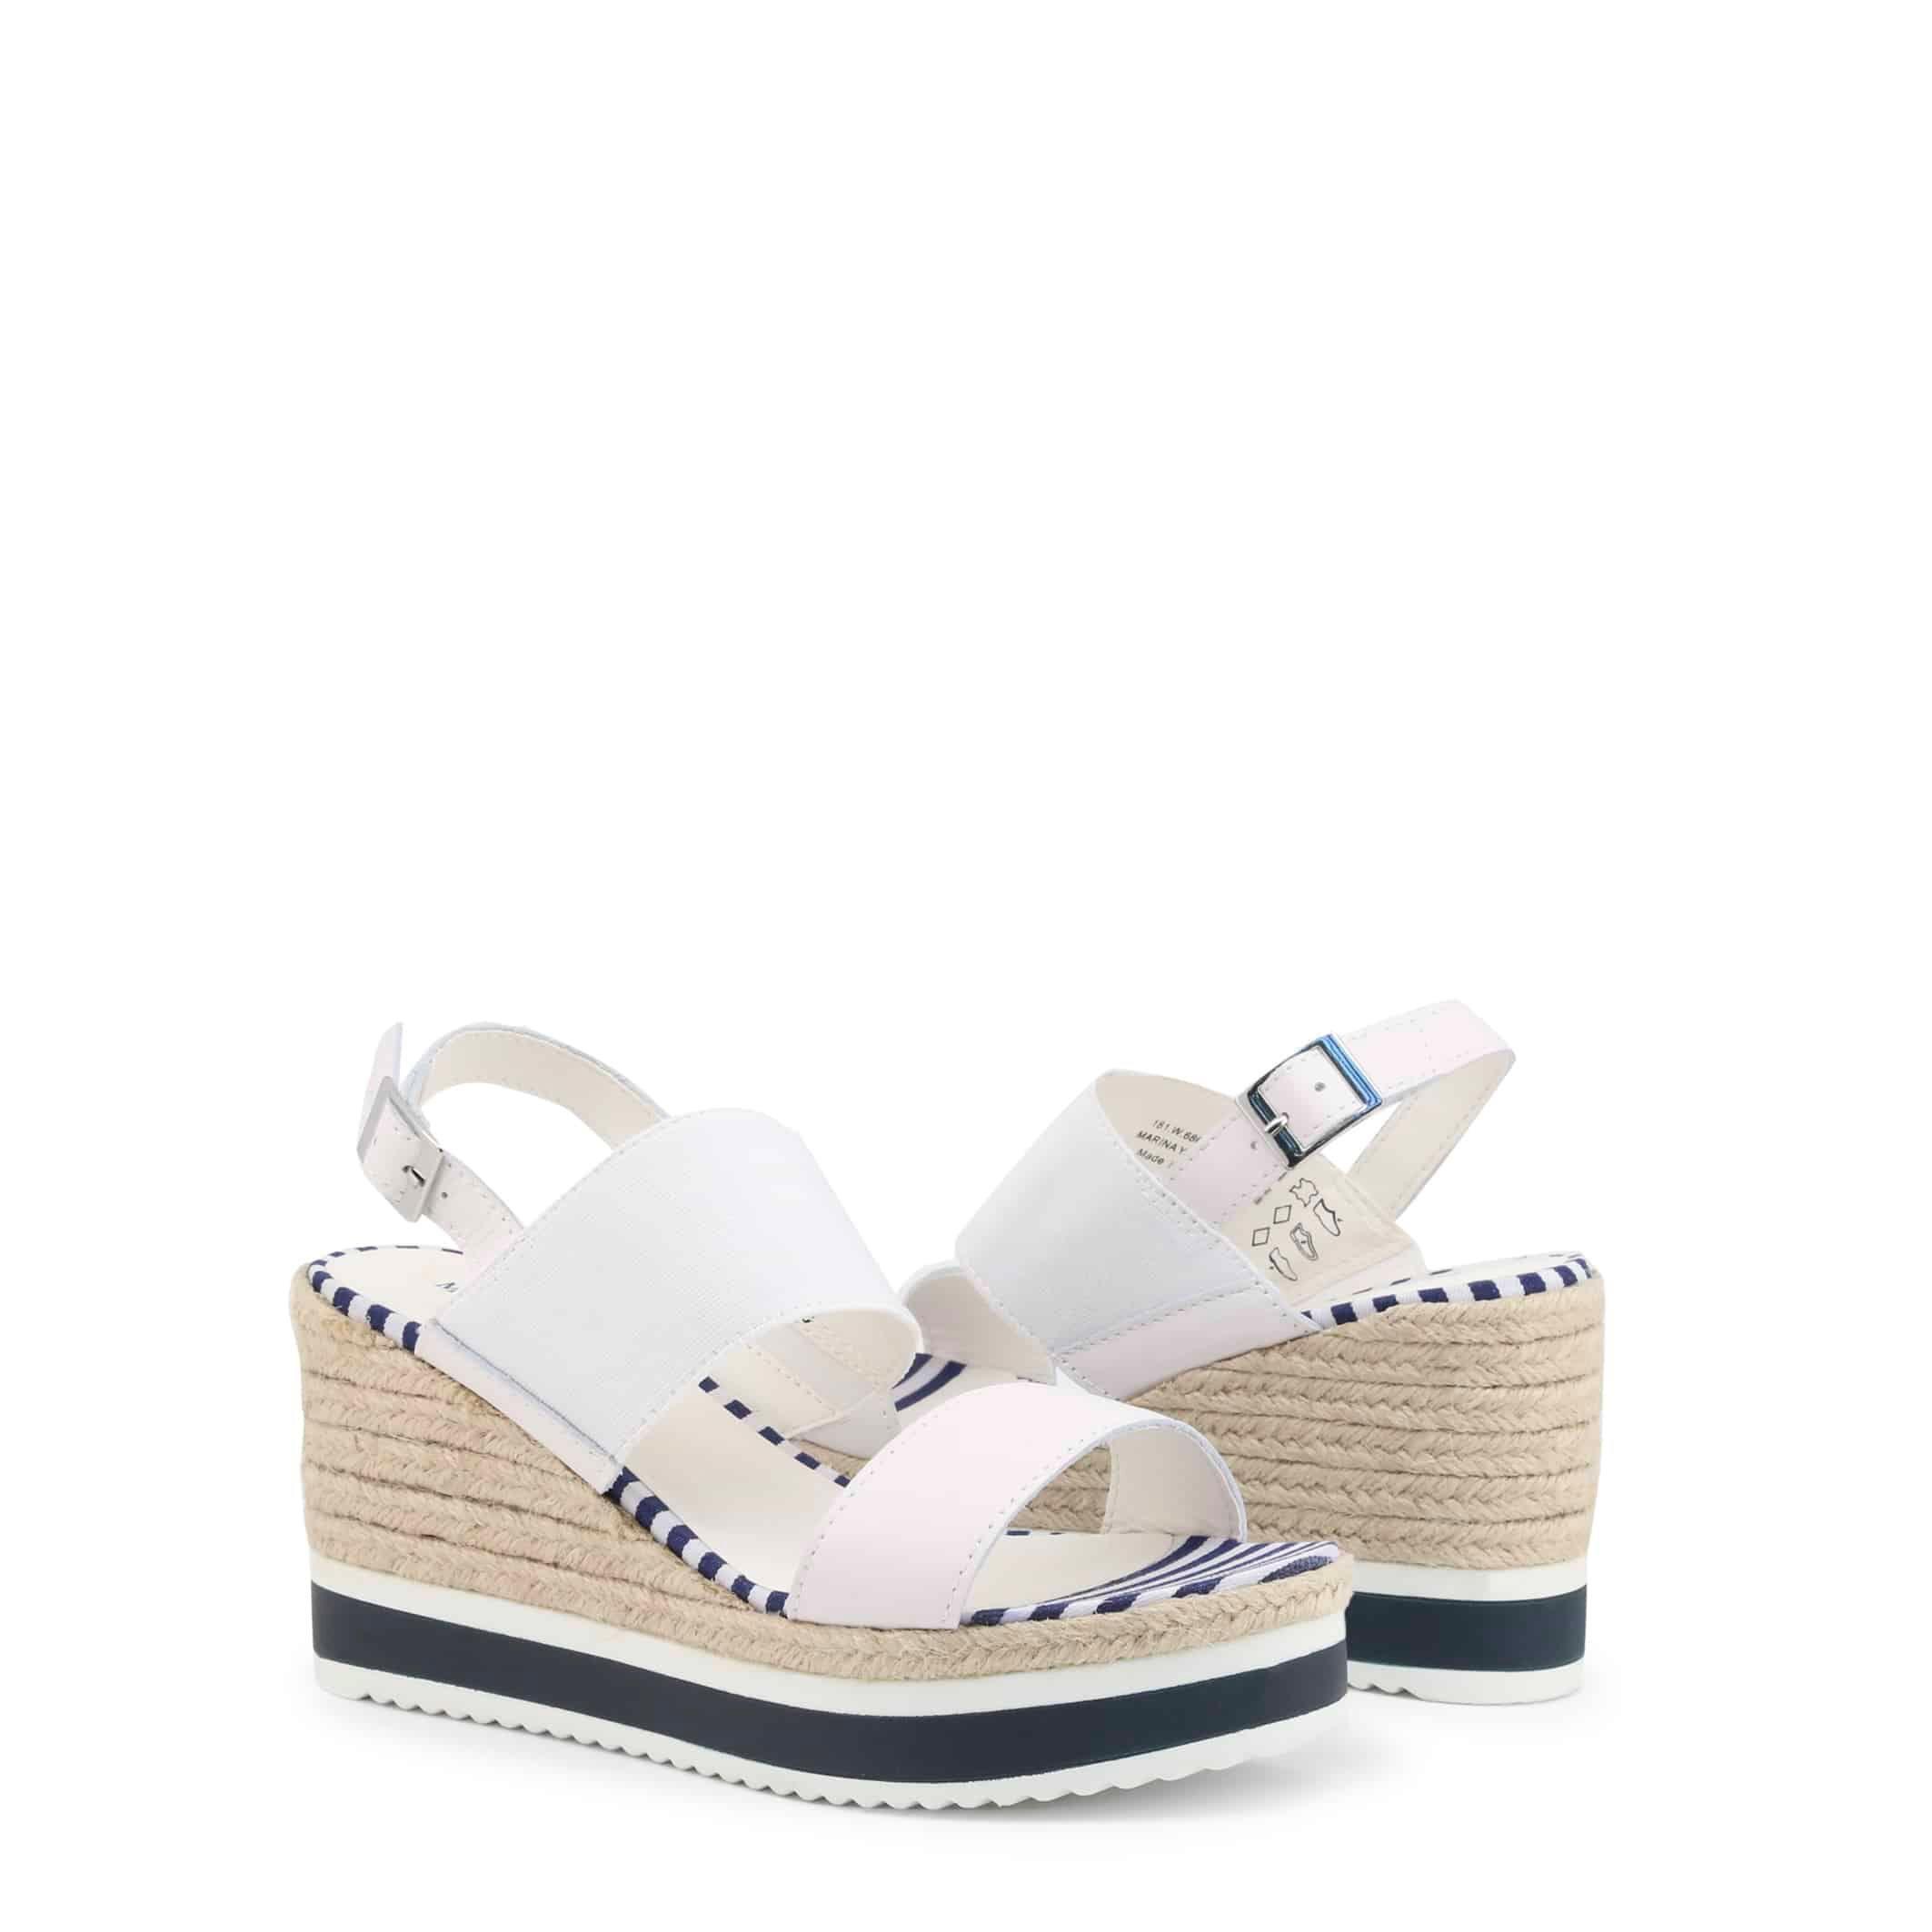 Marina Yachting - EUPHORIA181W686637  | You Fashion Outlet